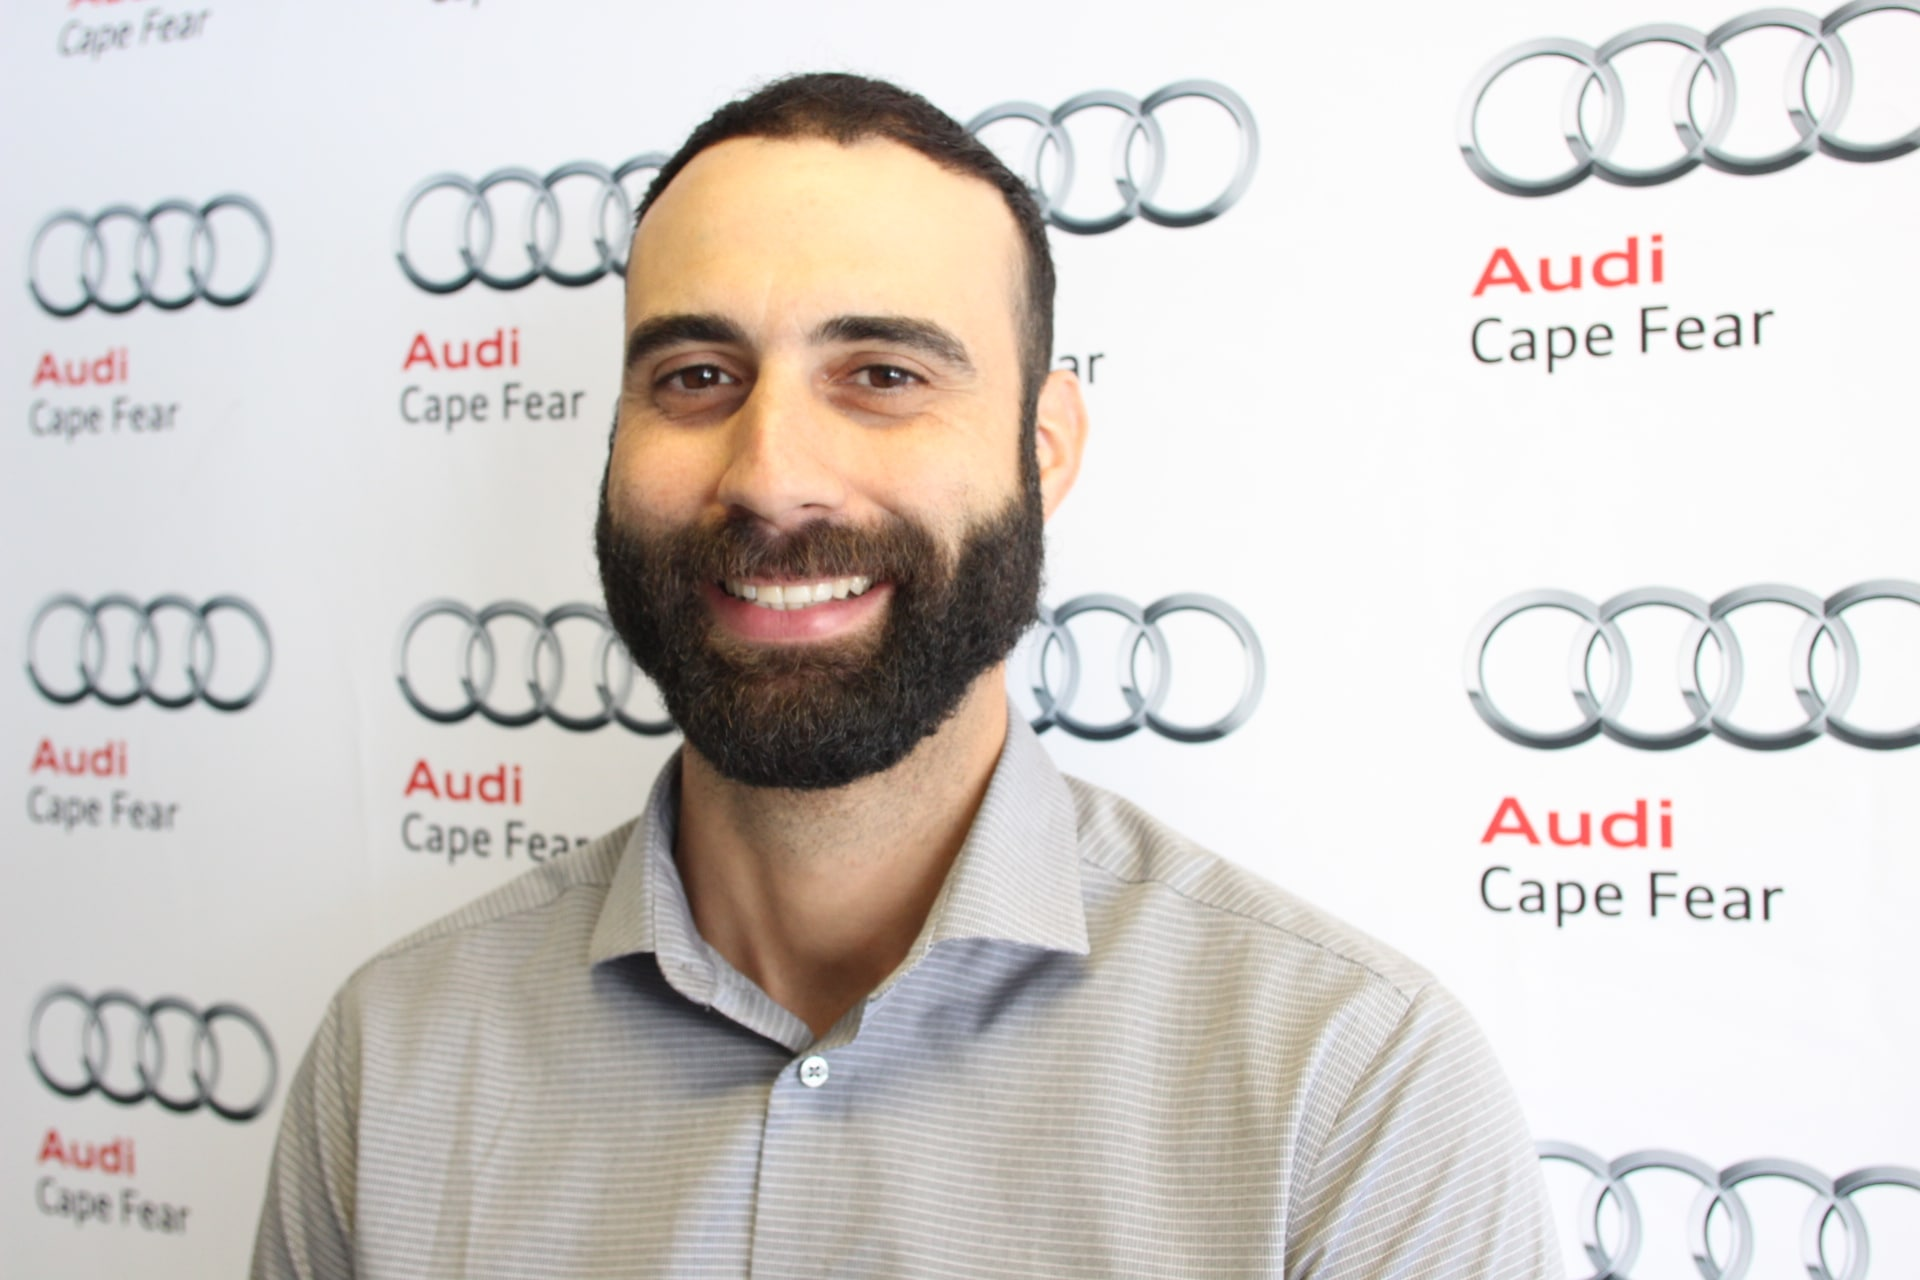 Cape Fear Audi >> Audi Cape Fear | New Audi dealership in Wilmington, NC 28403